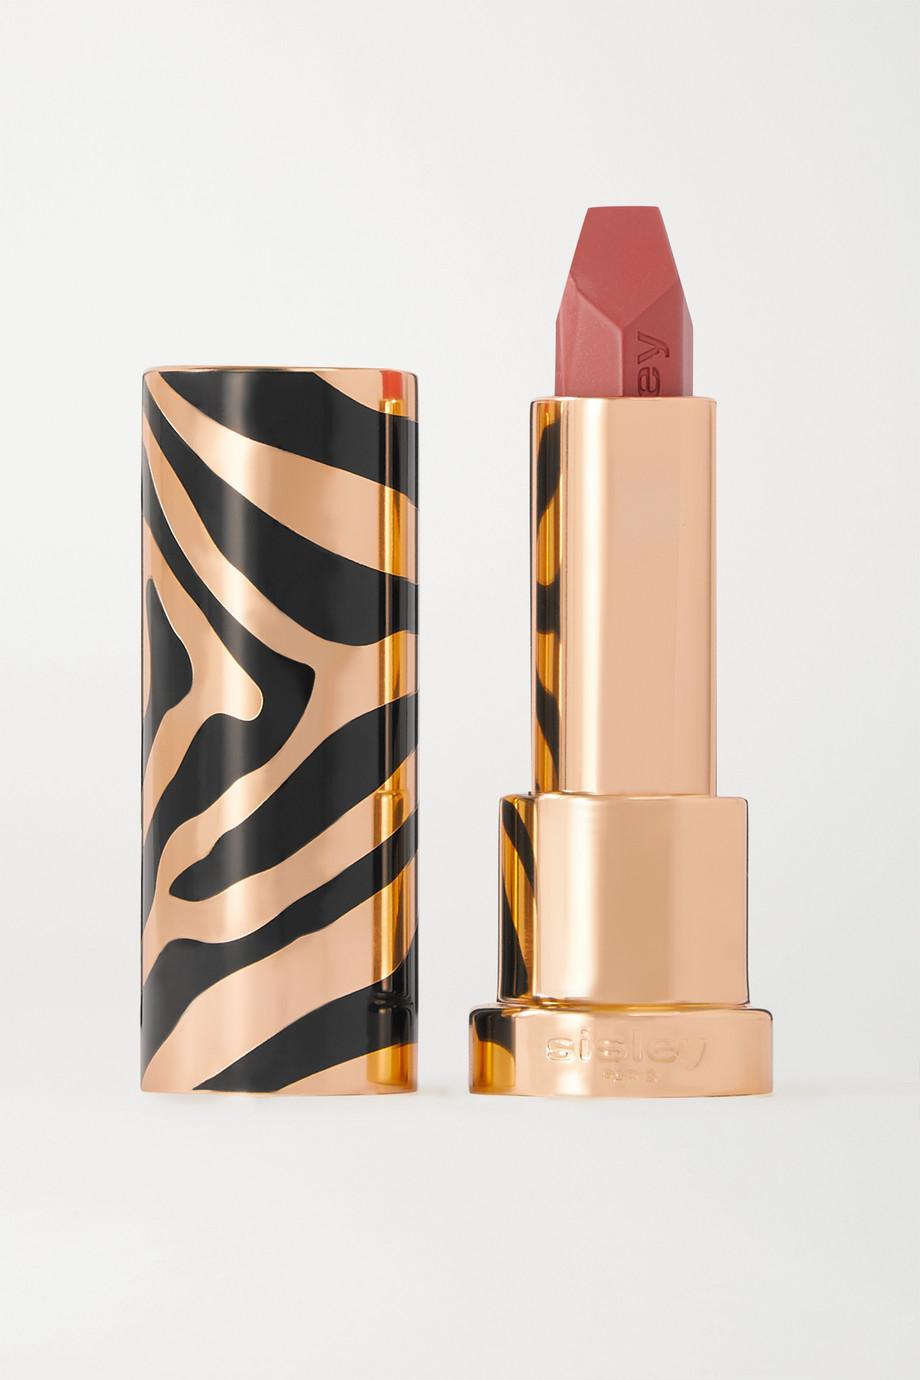 Sisley Le Phyto Rouge Lipstick - 15 Beige Manhattan